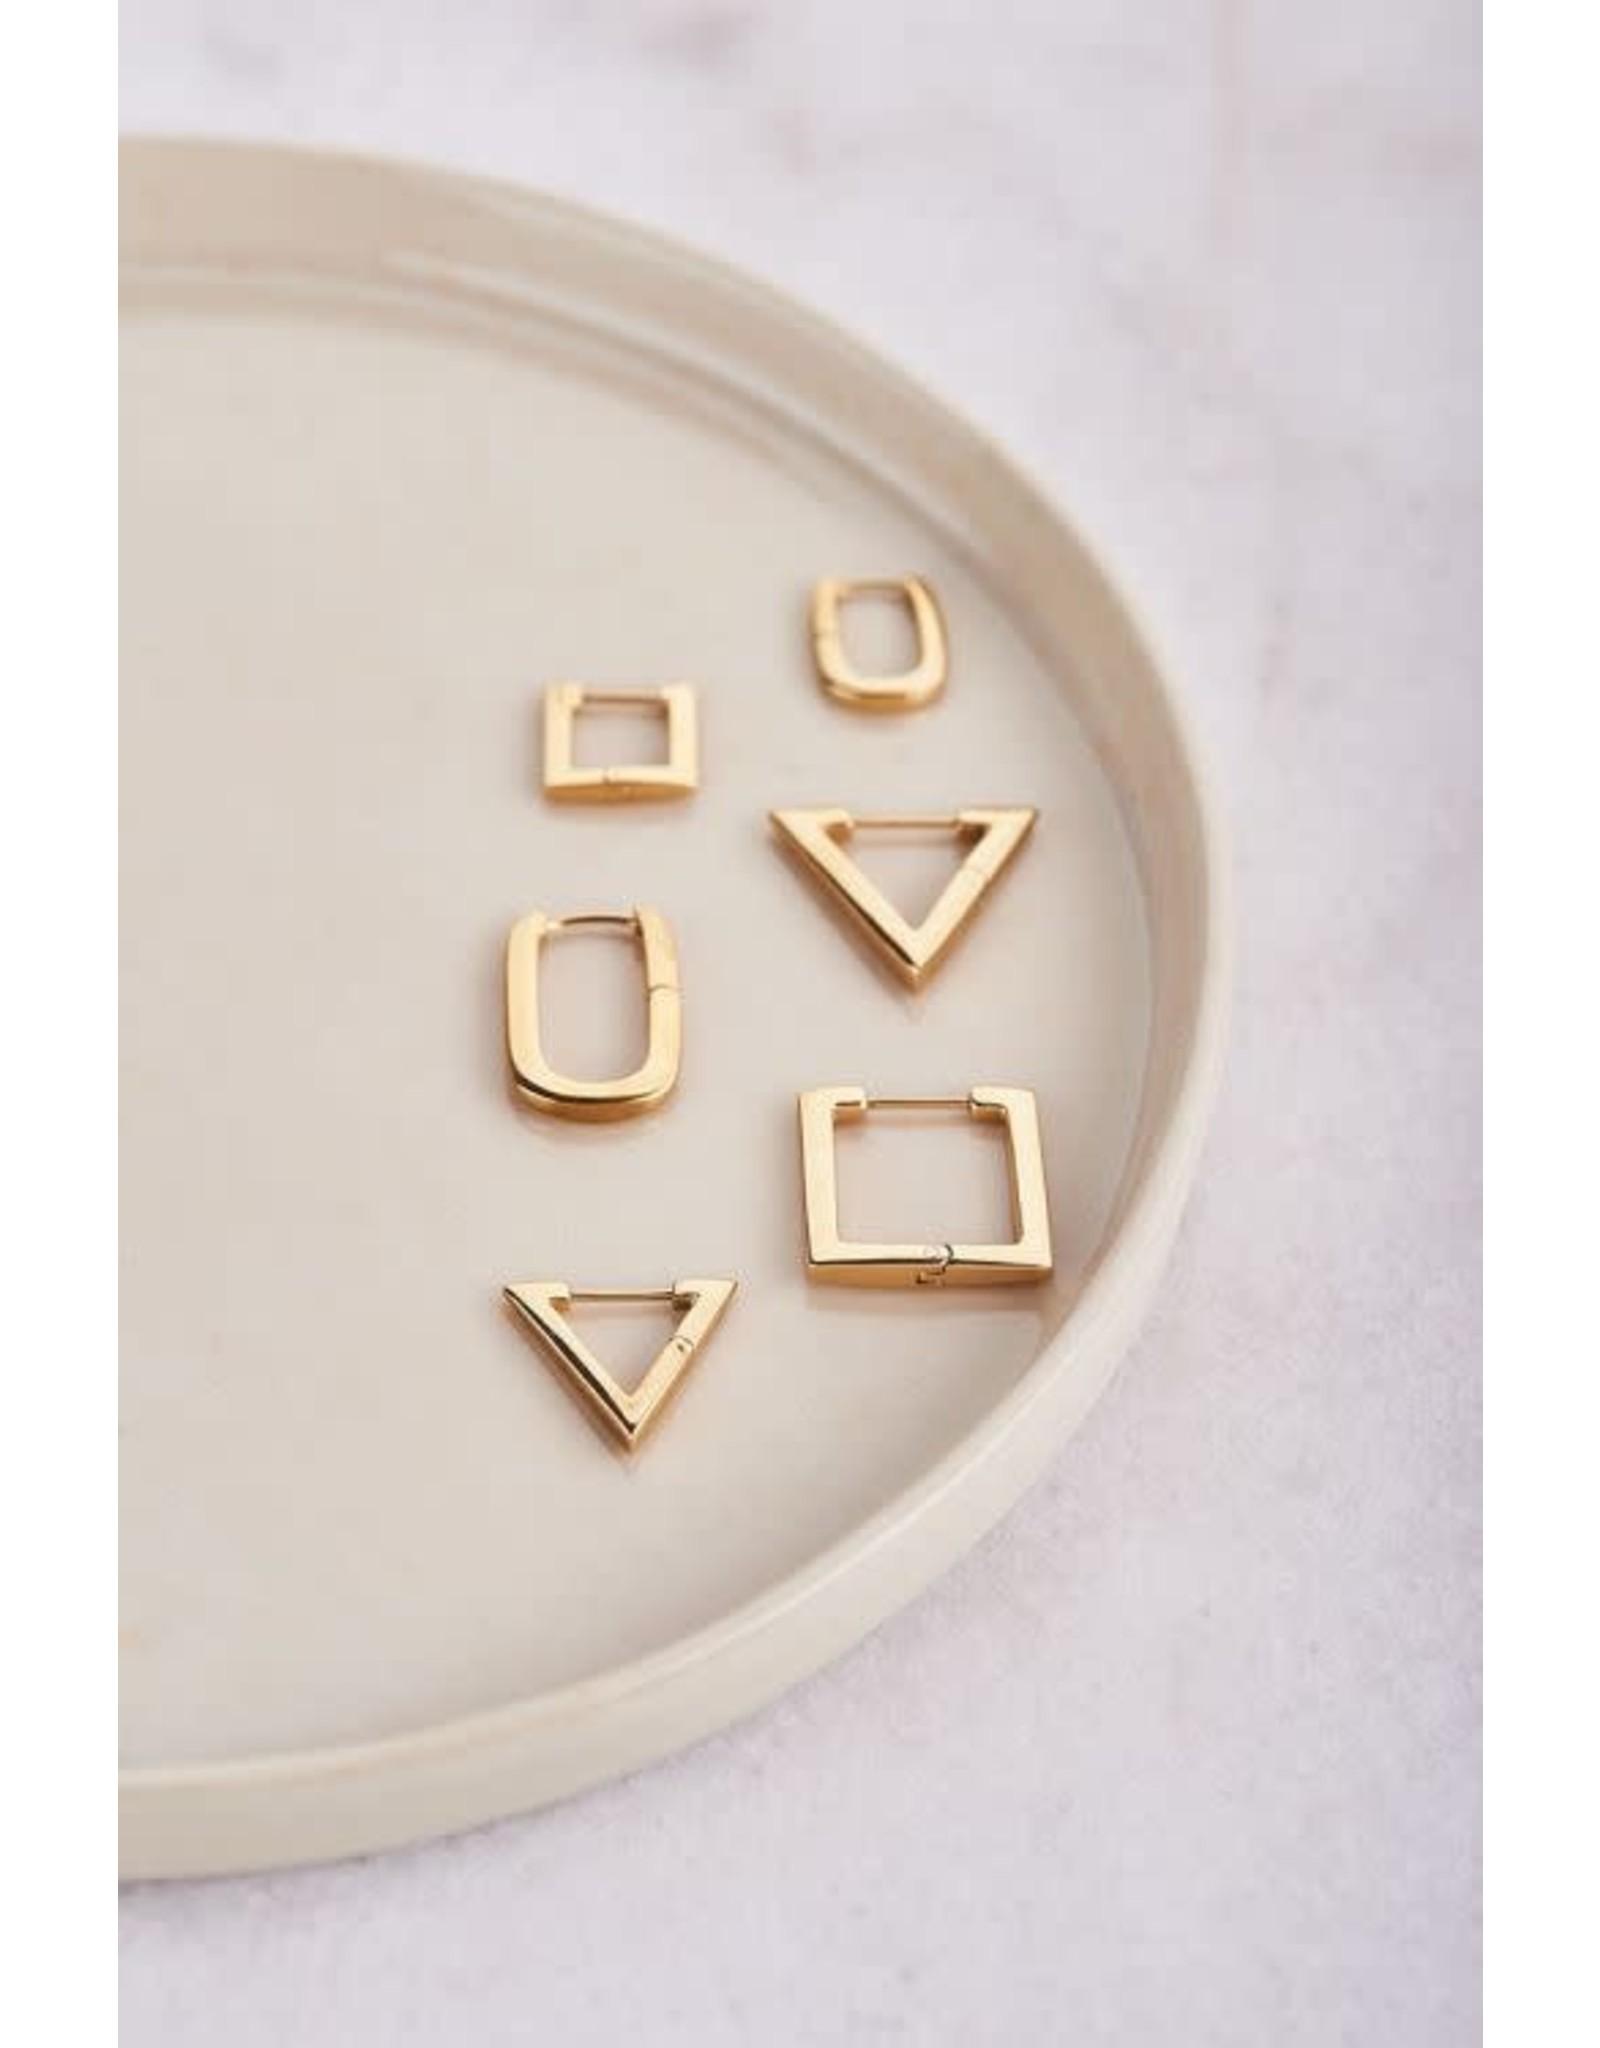 My Jewellery My Jewellery oorbellen driehoek klein